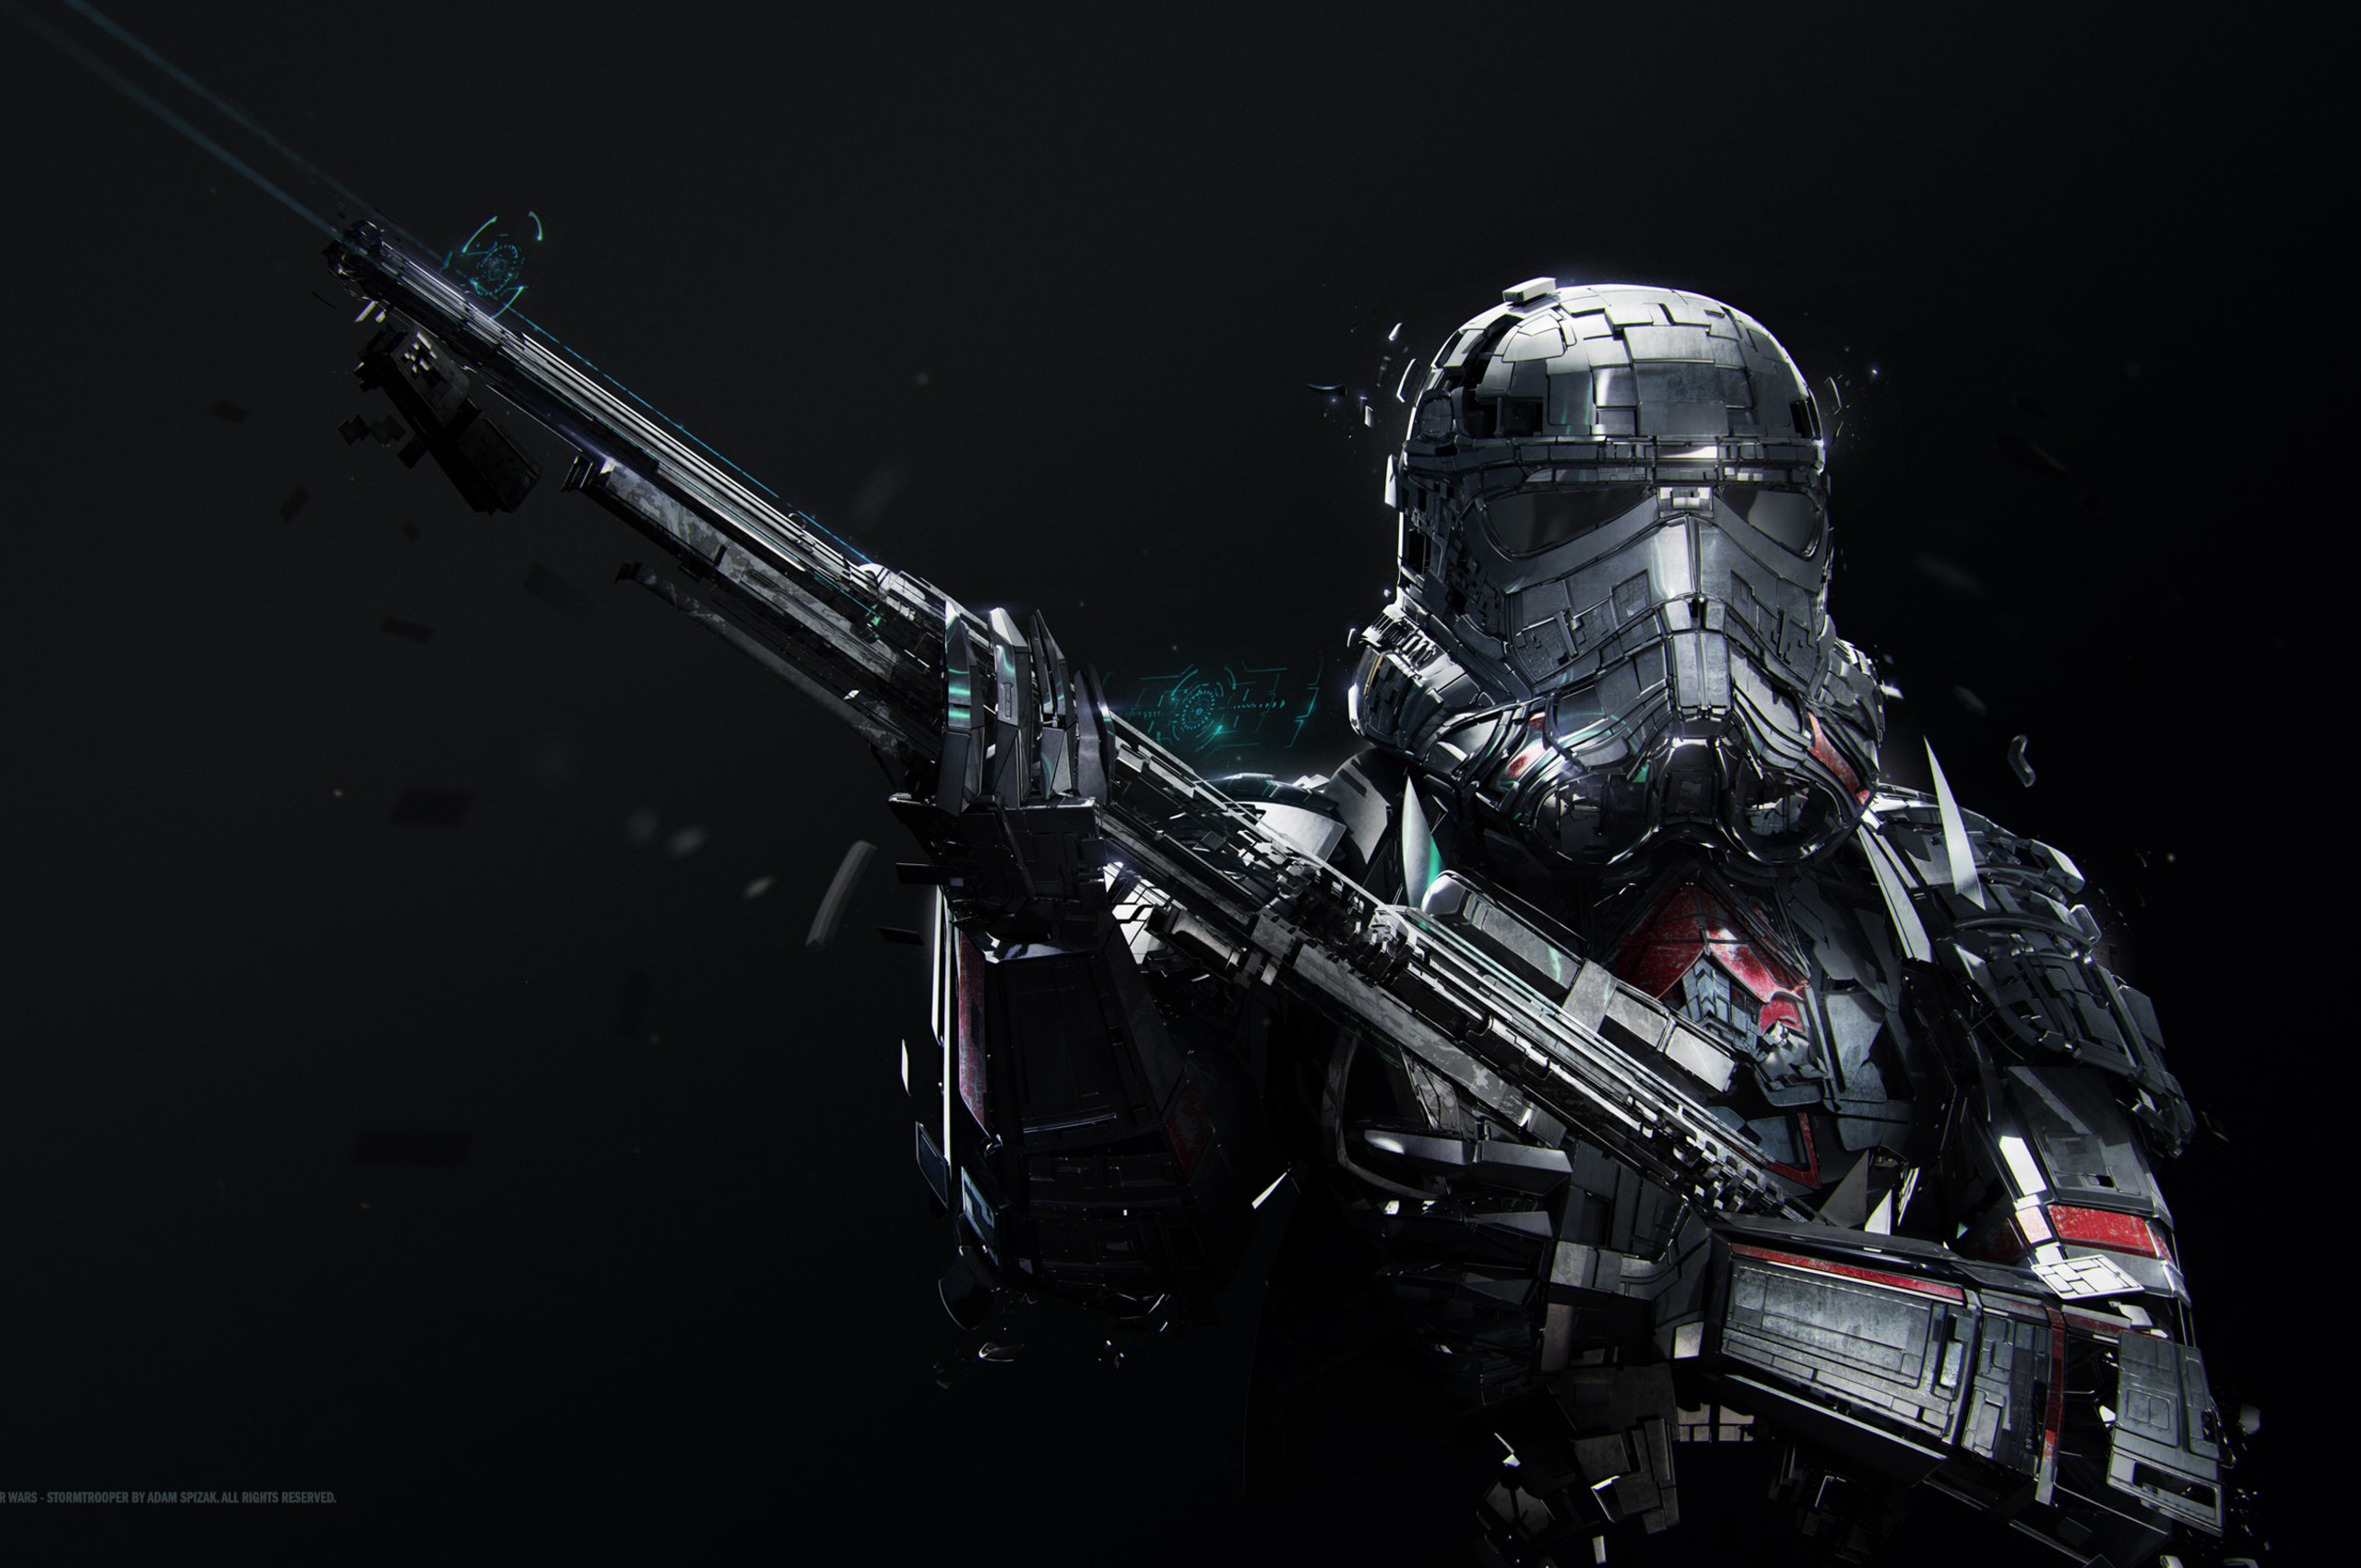 star wars stormtrooper 4k